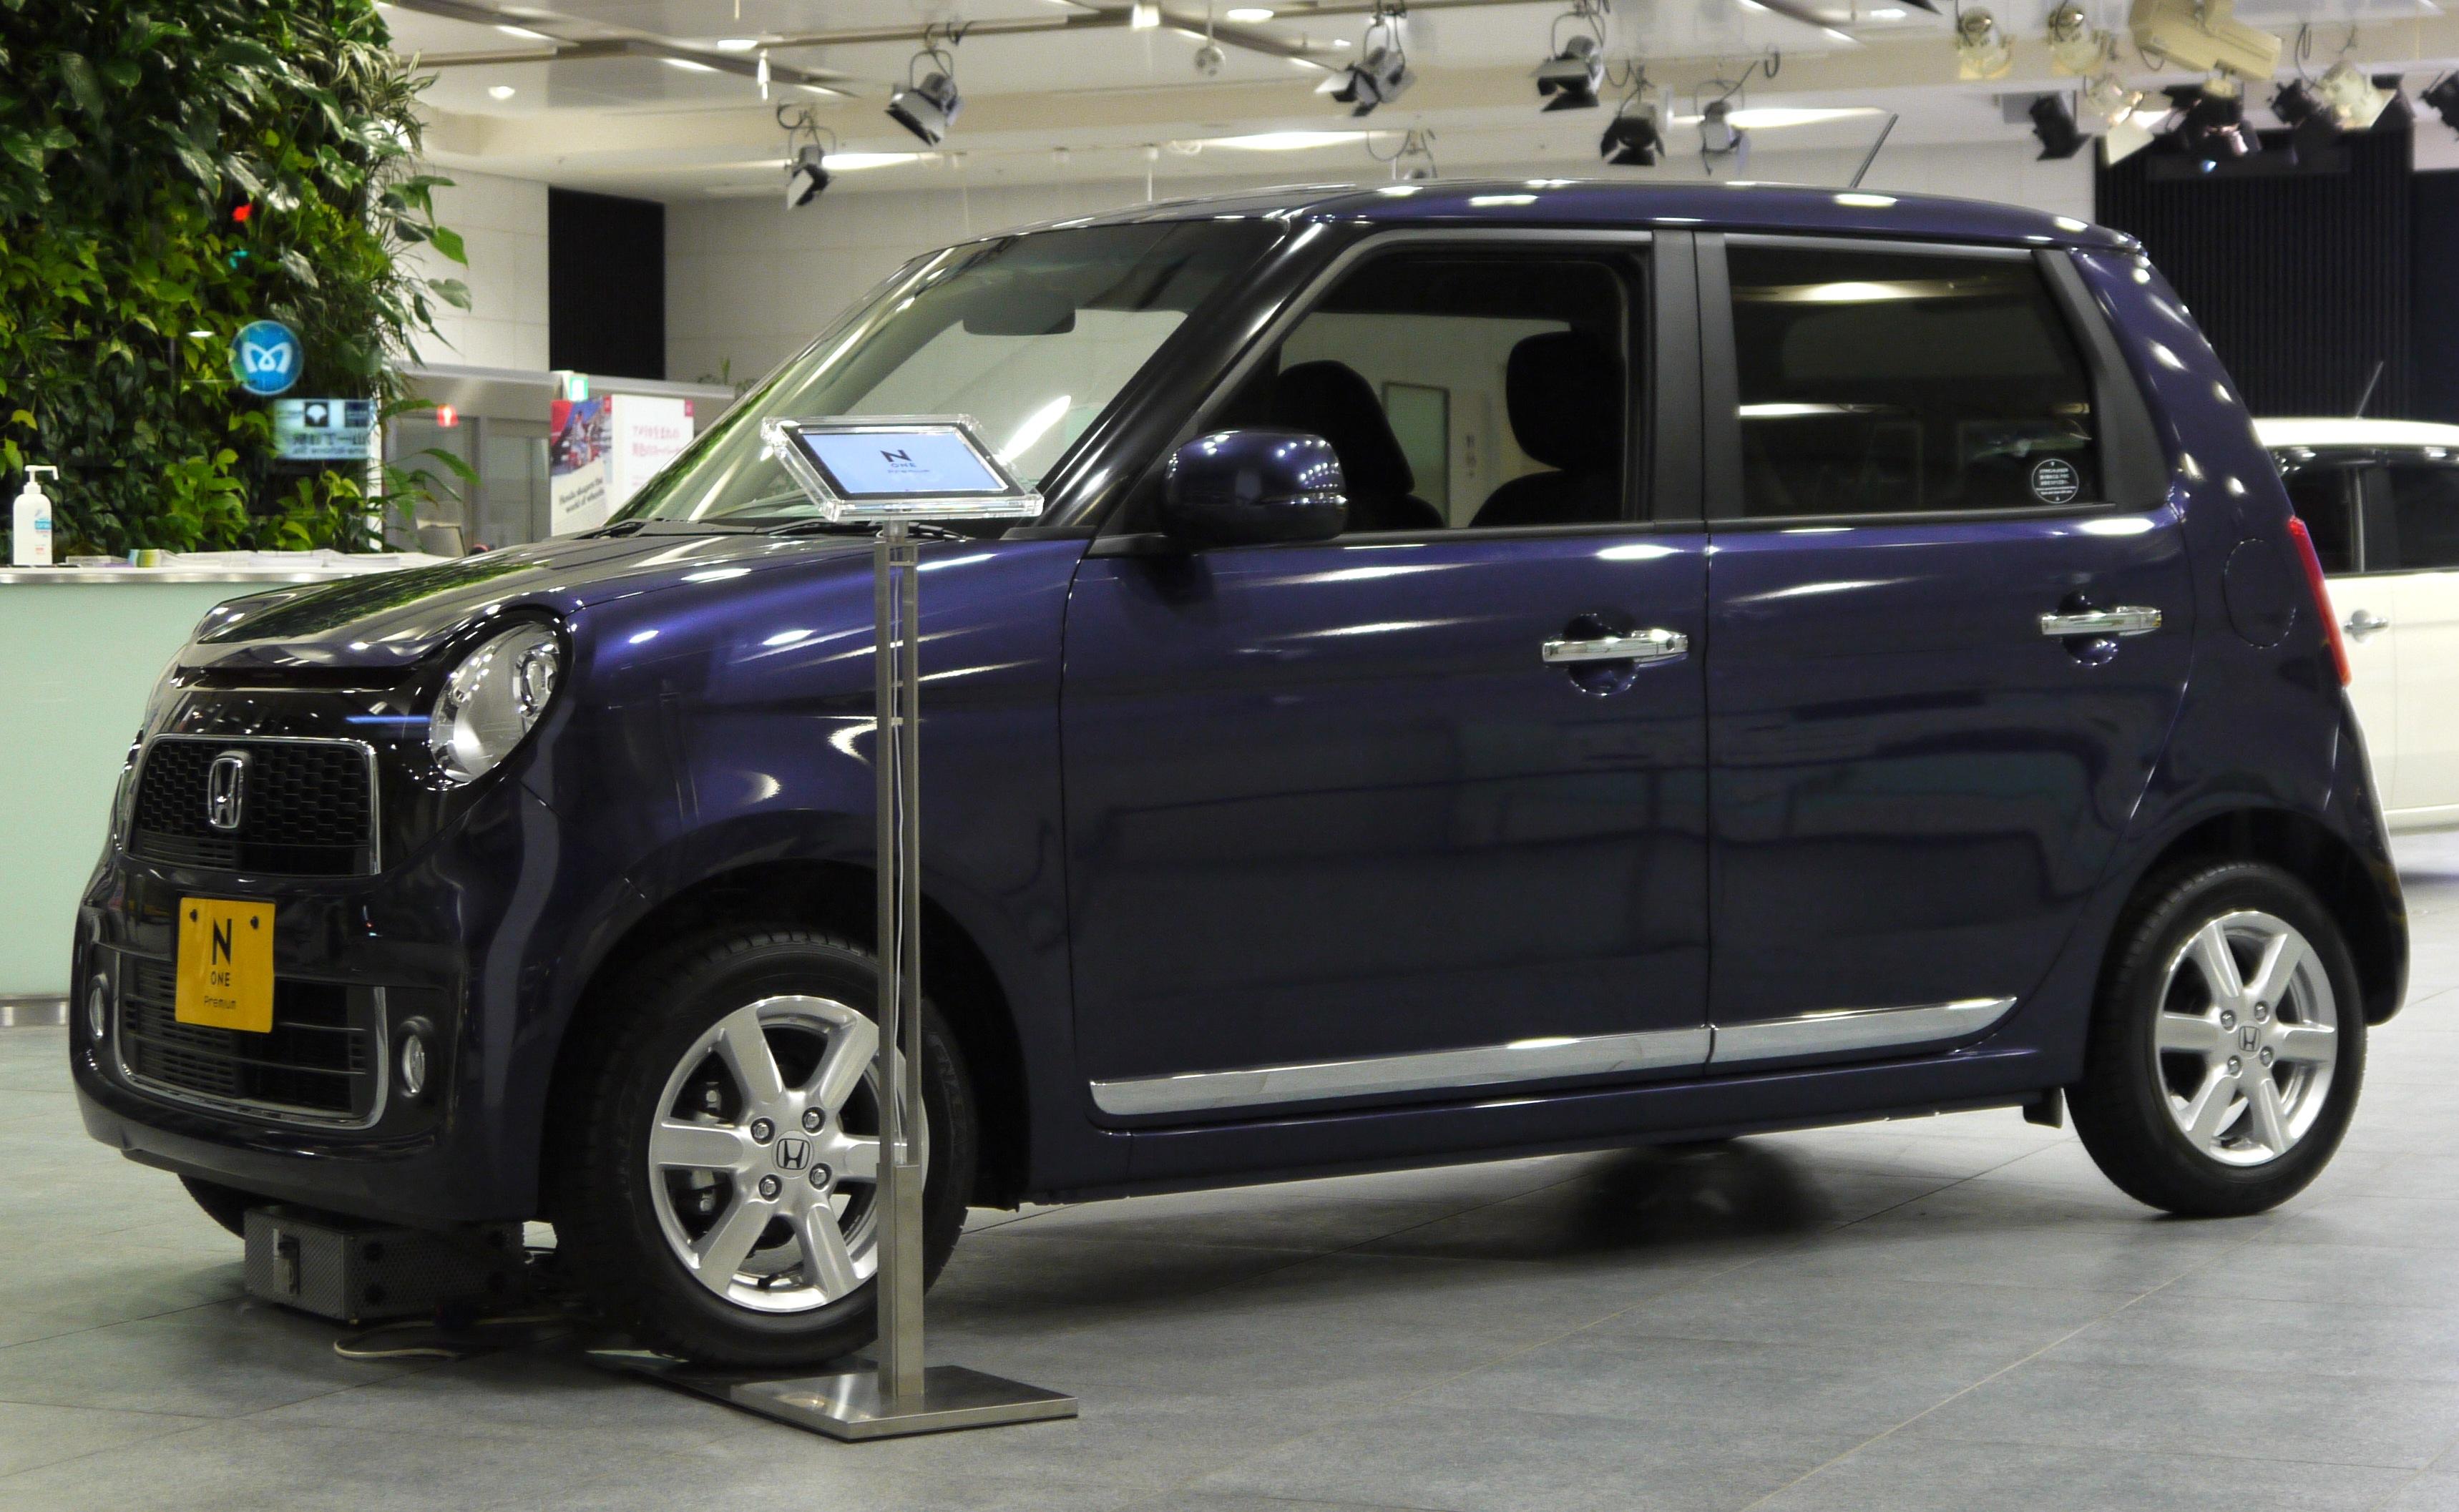 Honda n one premium blue jpg wikipedia for N gents salon karachi prices